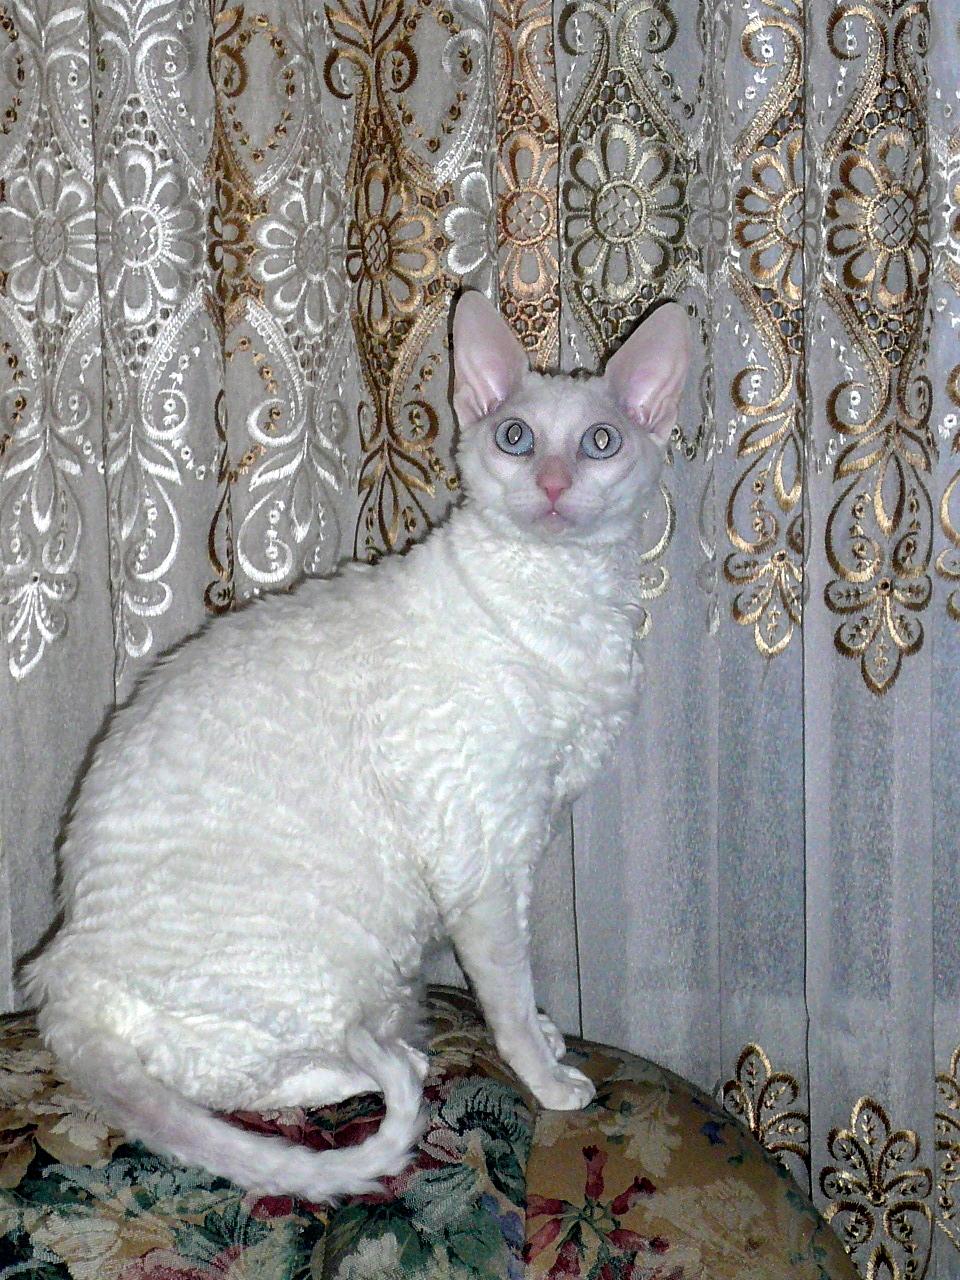 Какая кудрявая красавица! Знакомьтесь - кошка Джемма породы корниш-рекс :)